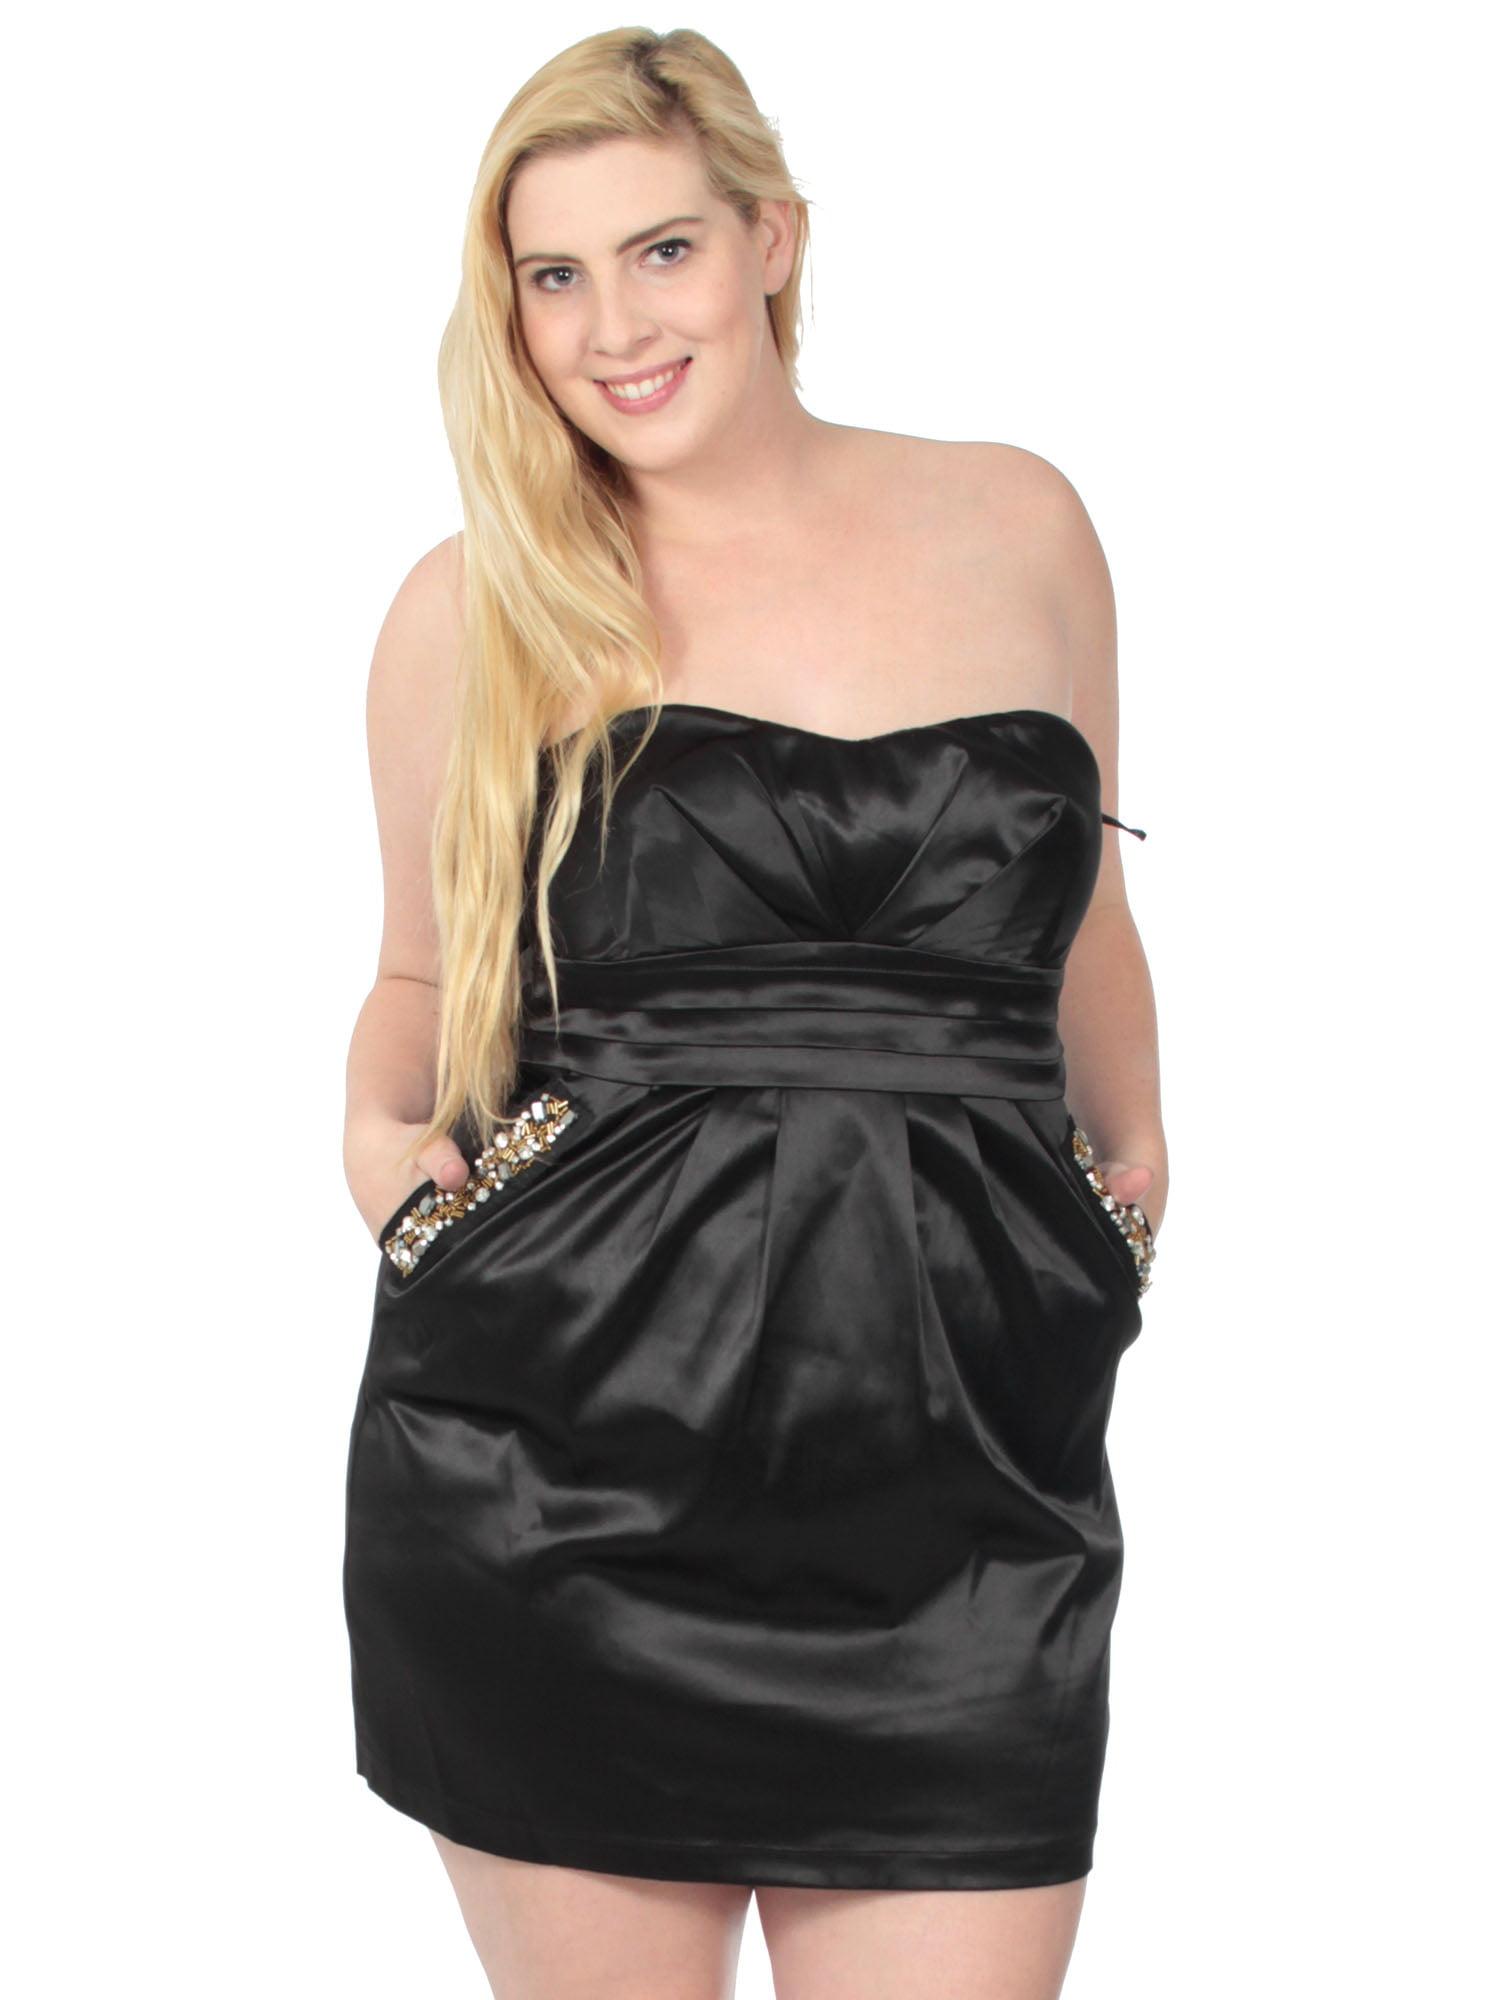 Single Dress Womens Plus Size Sweetheart Neckline Sleeveless Dress